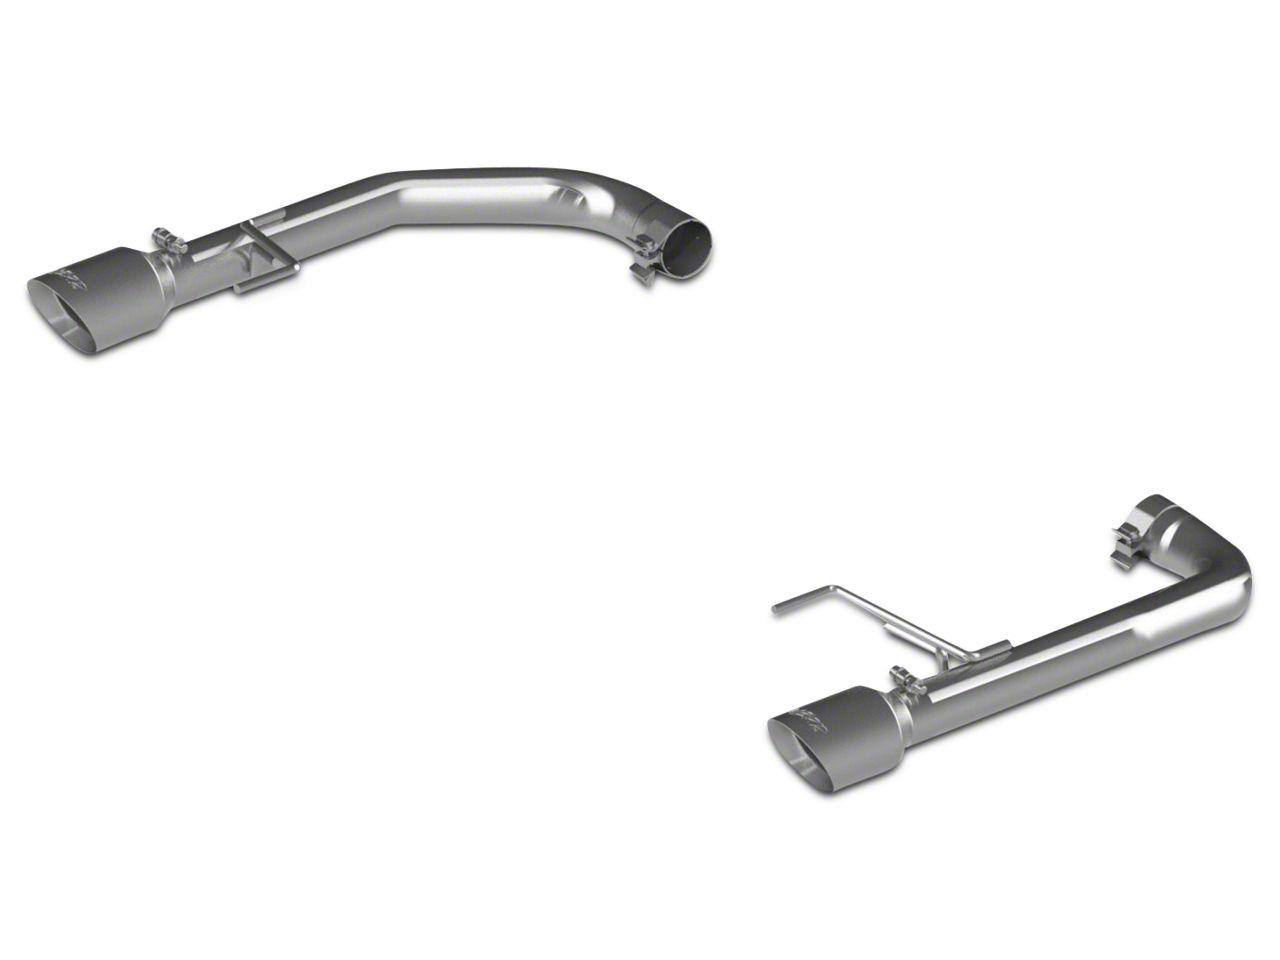 MBRP Pro Series Muffler Delete Axle-Back Exhaust (15-17 GT)